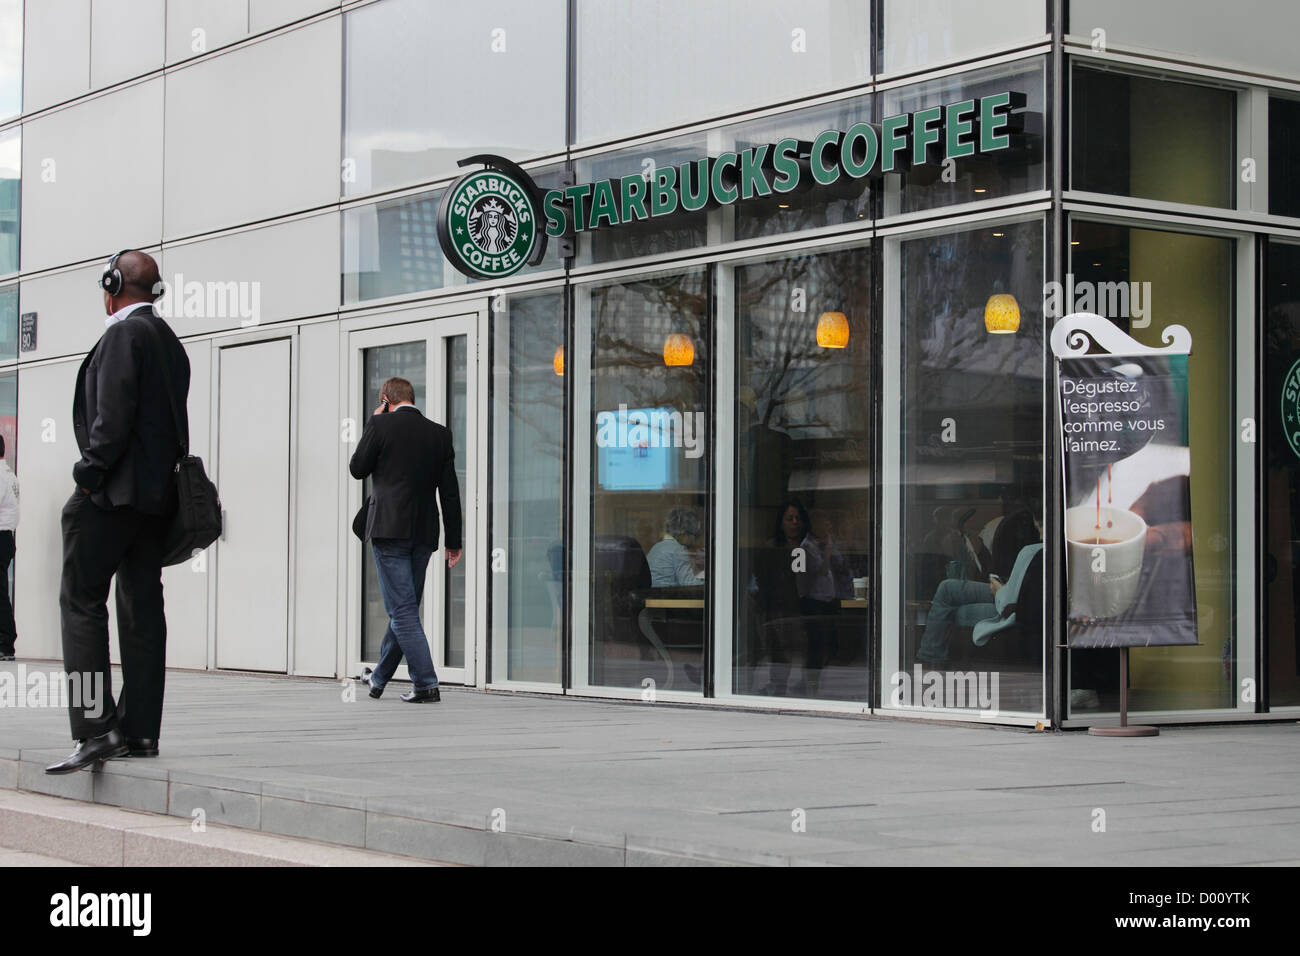 Starbucks Coeur Défense Coffee at the Voie des Batisseurs in la Défense in Paris - Stock Image